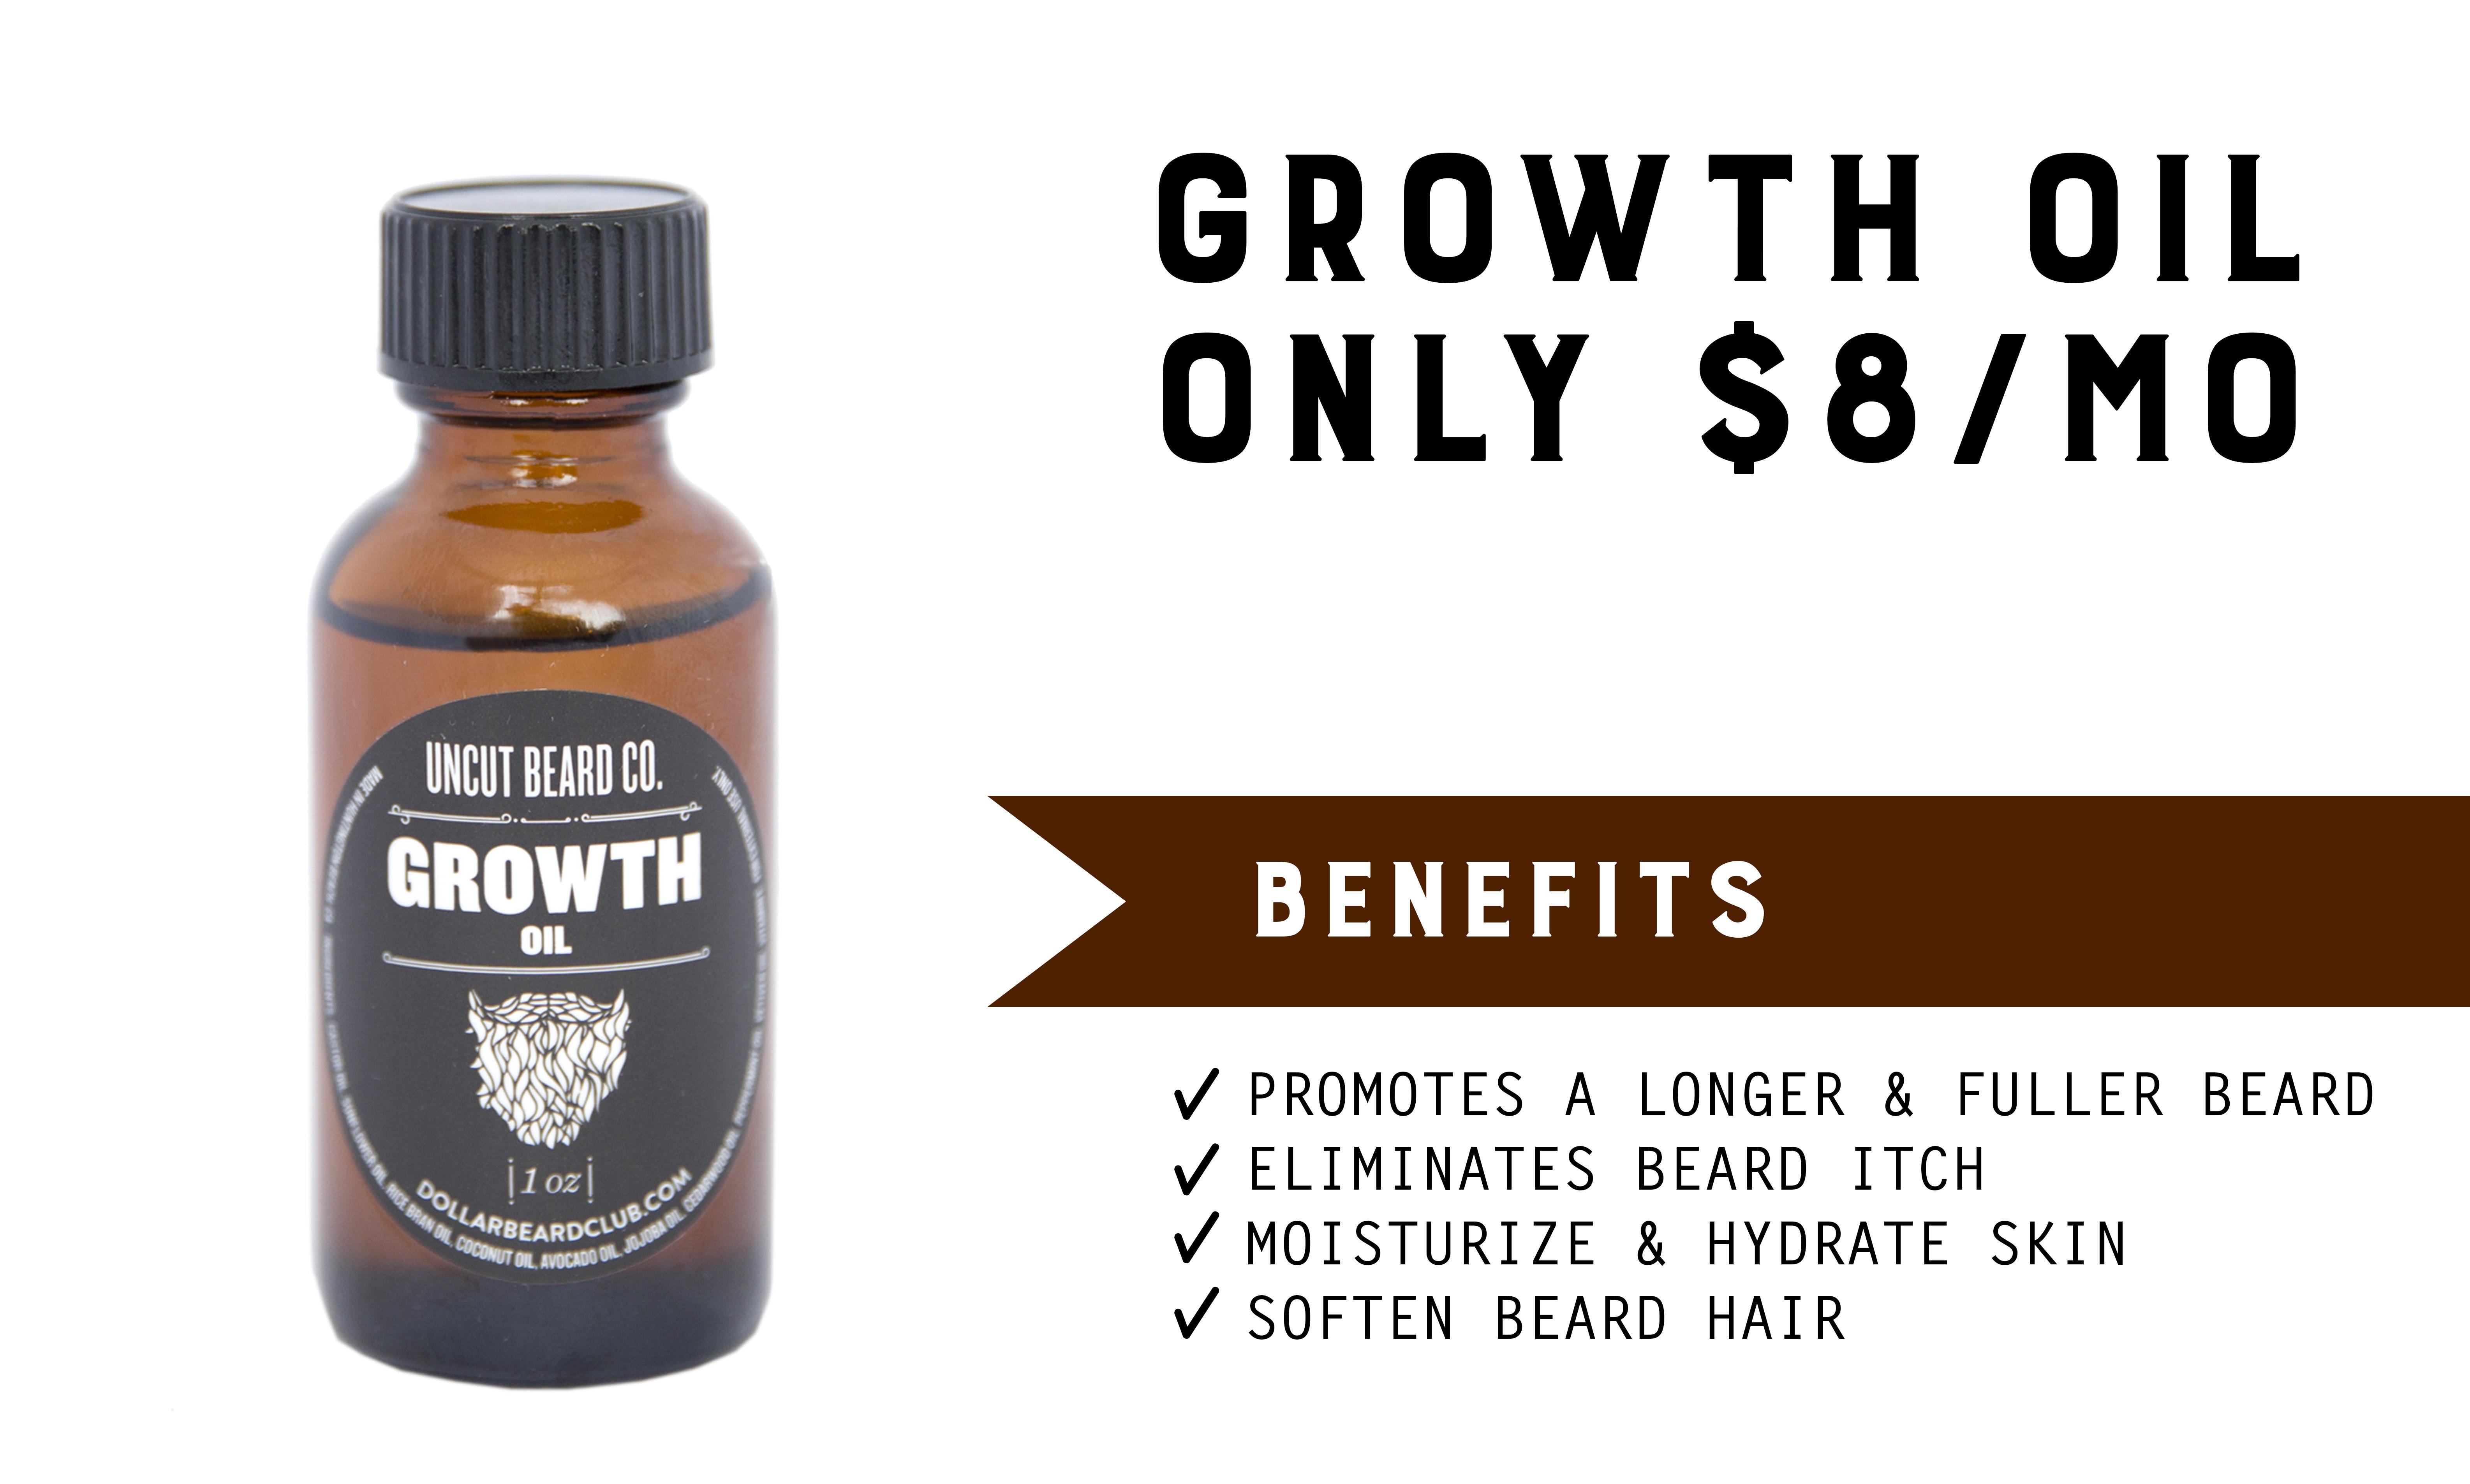 GrowthOil